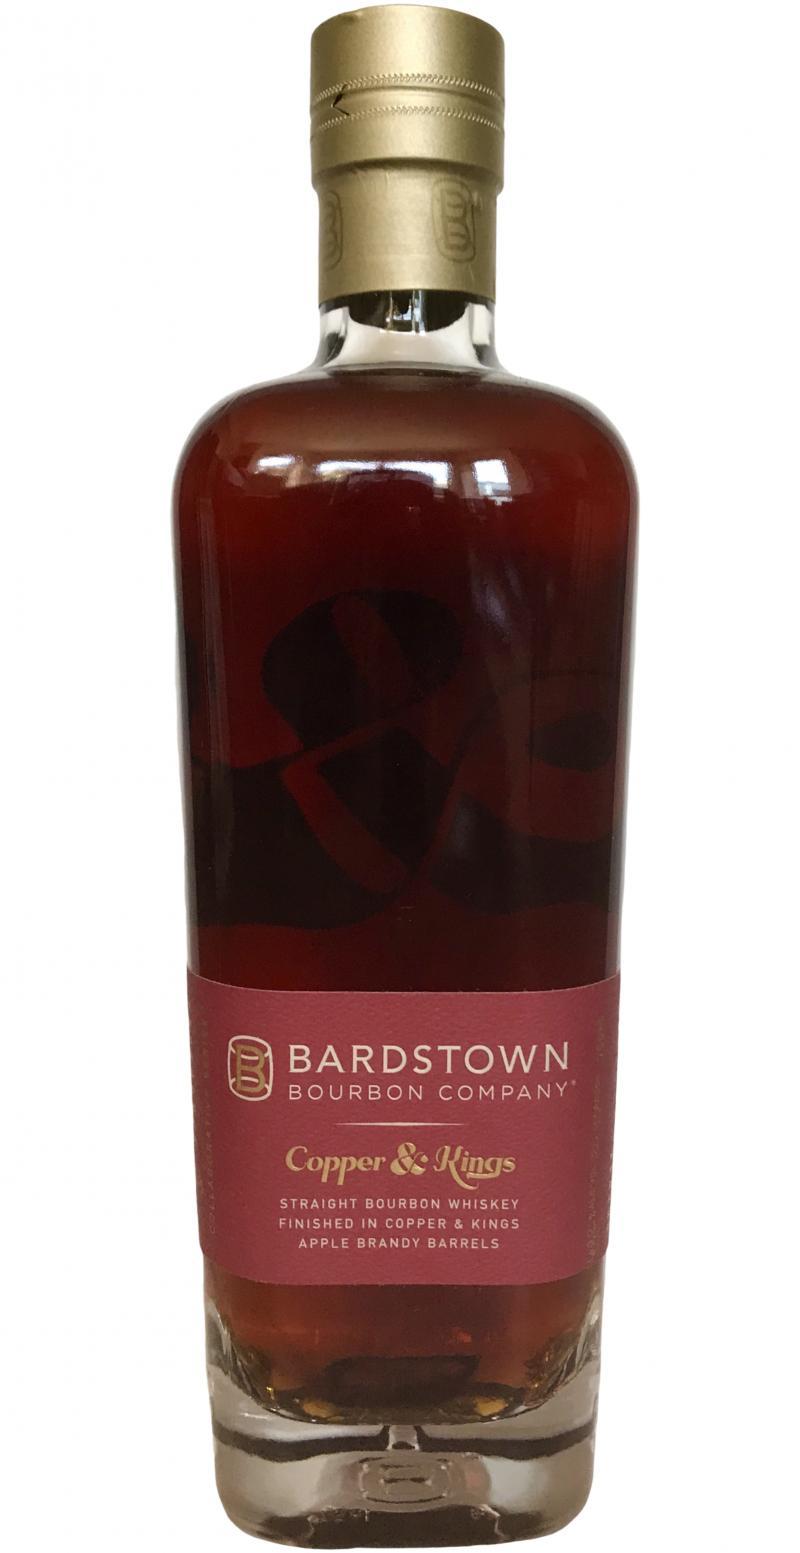 Bardstown Bourbon Company Copper & Kings